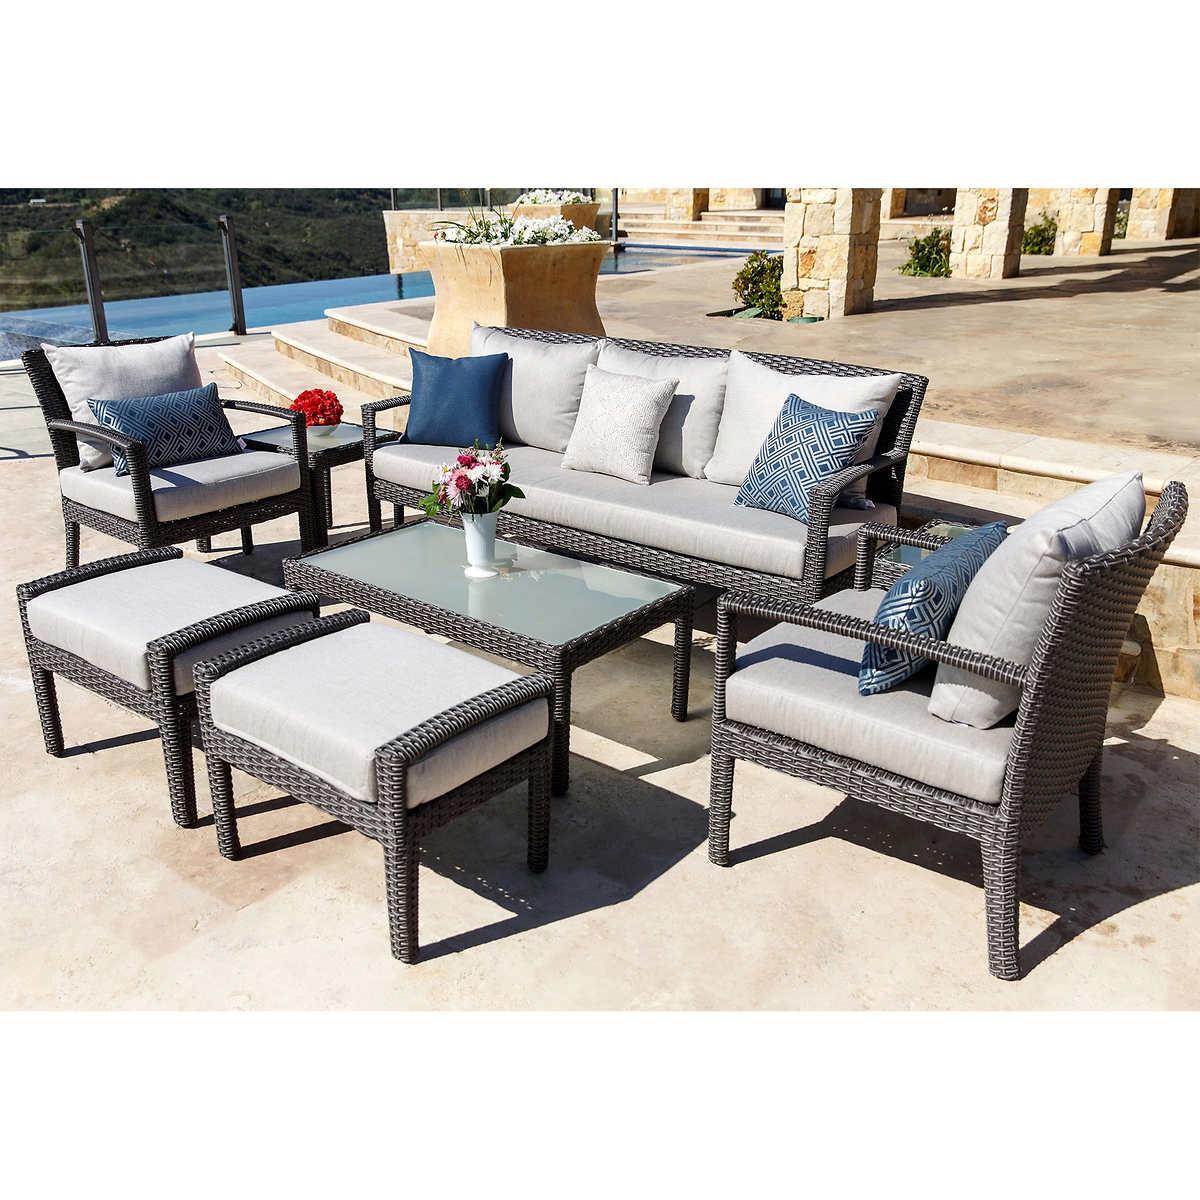 Furniture swivel and tub chairs dori fabric swivel cuddle chair - Cambridge 8 Piece Seating Set